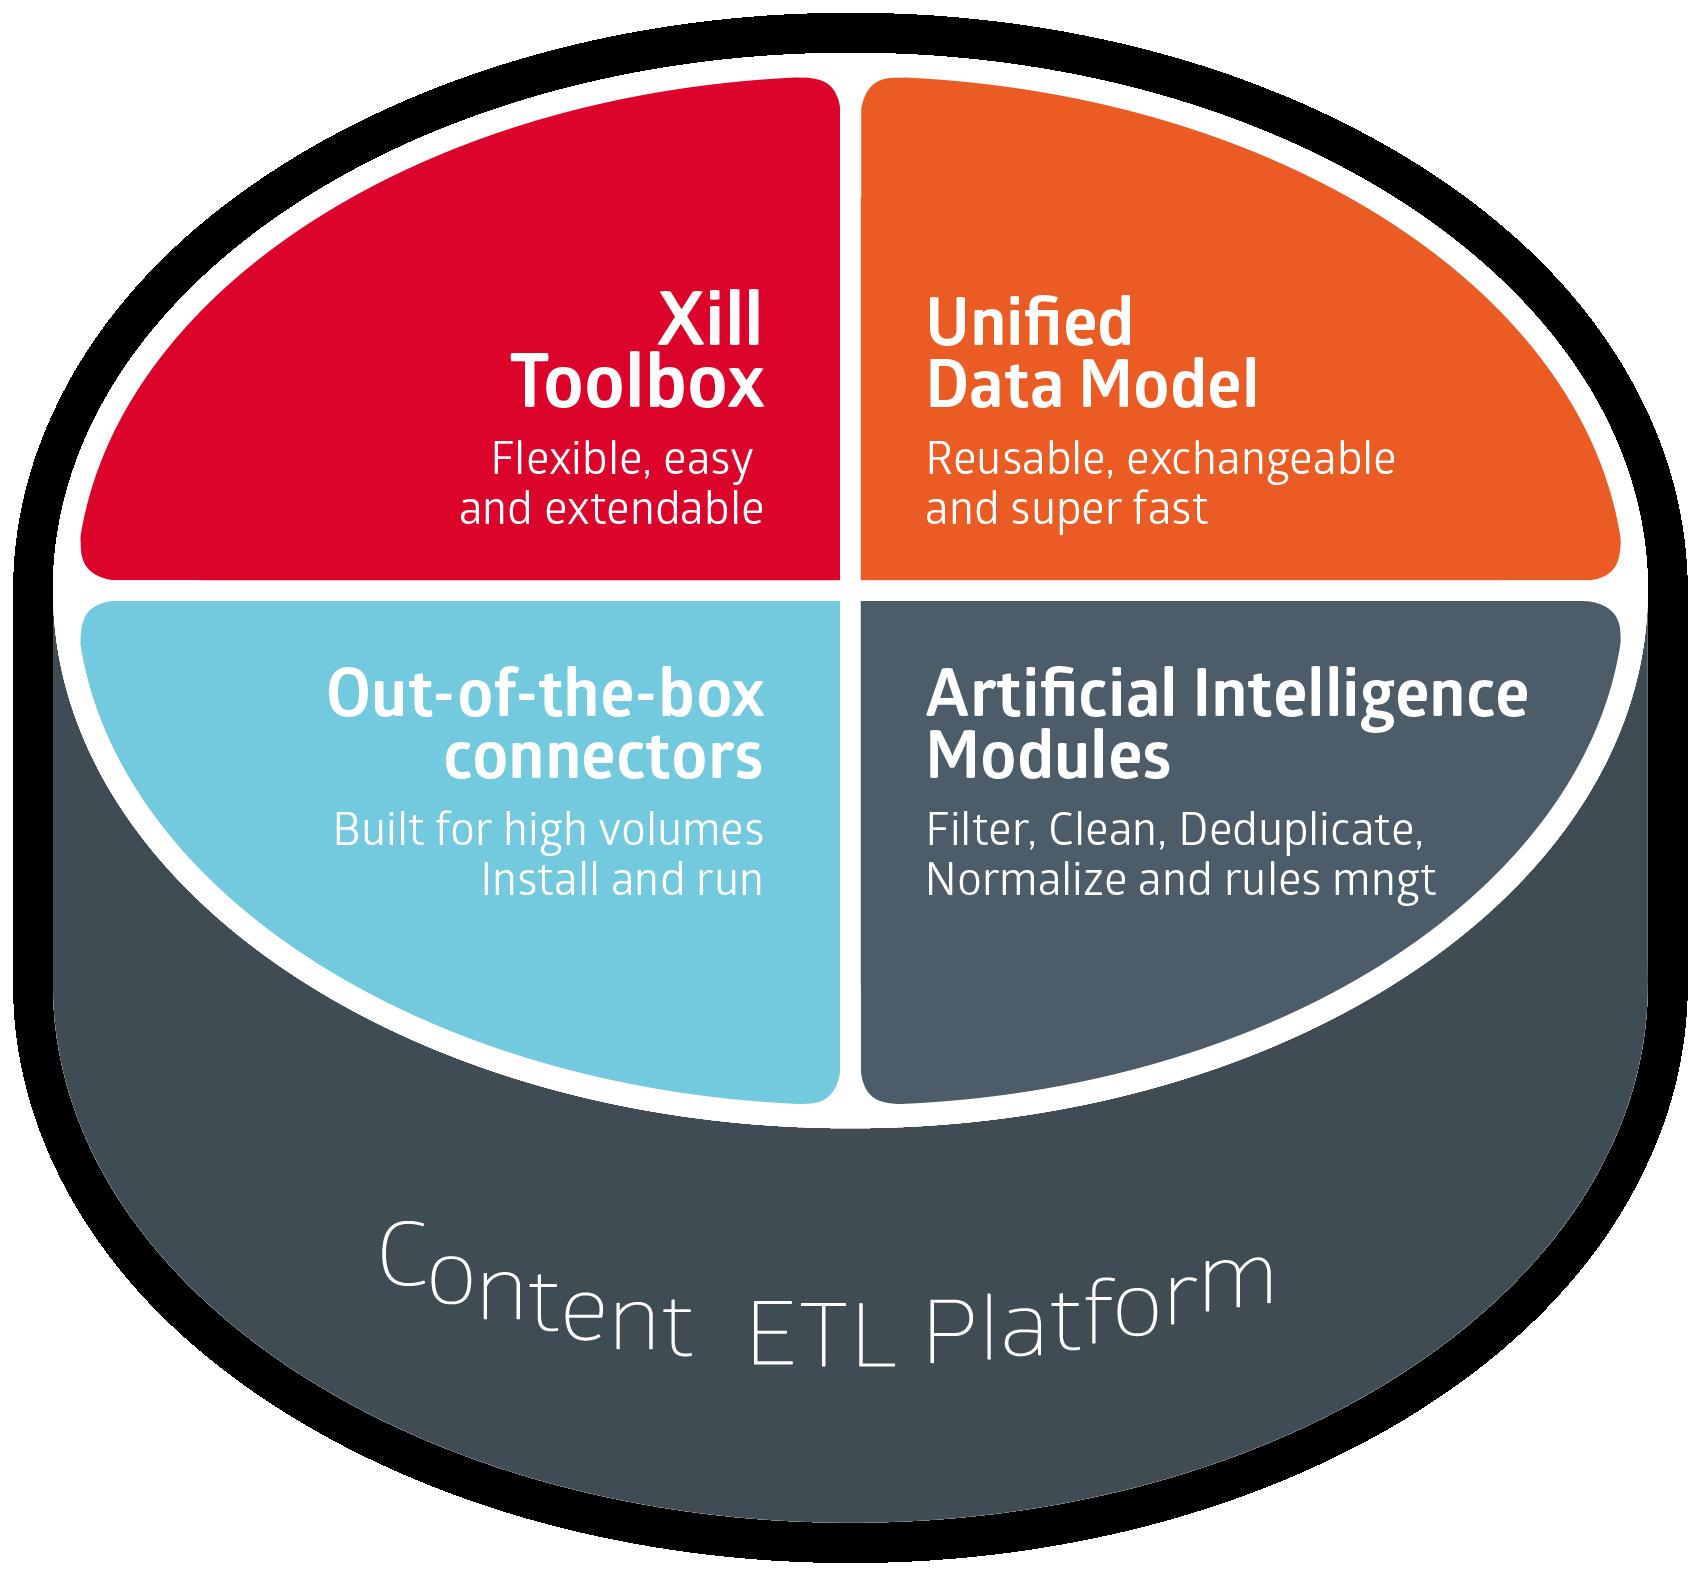 Content ETL Integration Platform